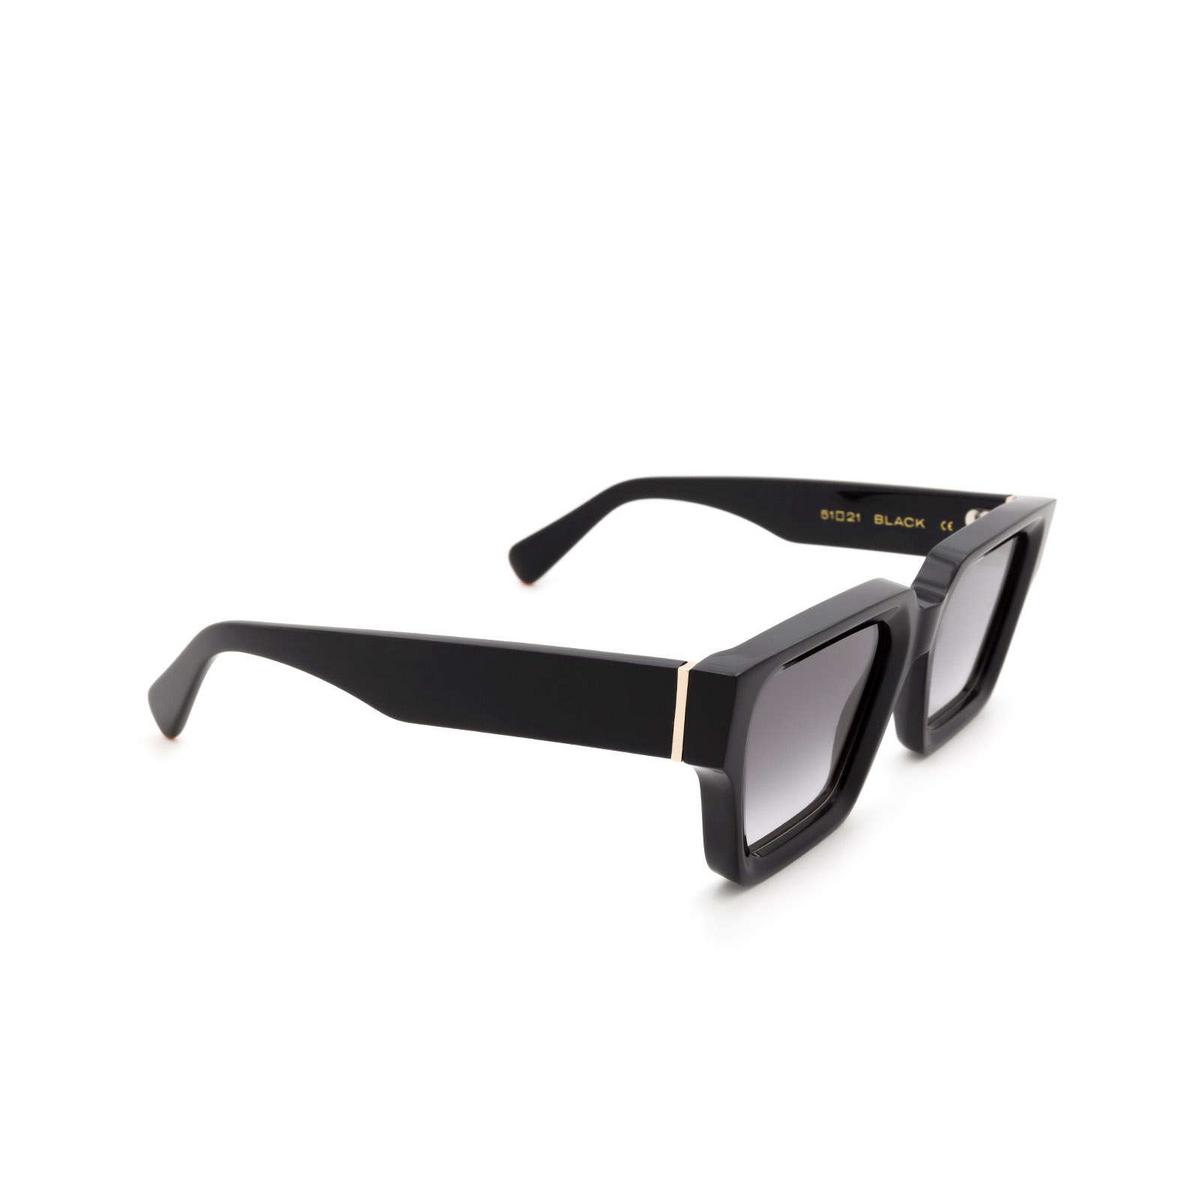 Chimi® Square Sunglasses: Craftmanship Square color Black - three-quarters view.